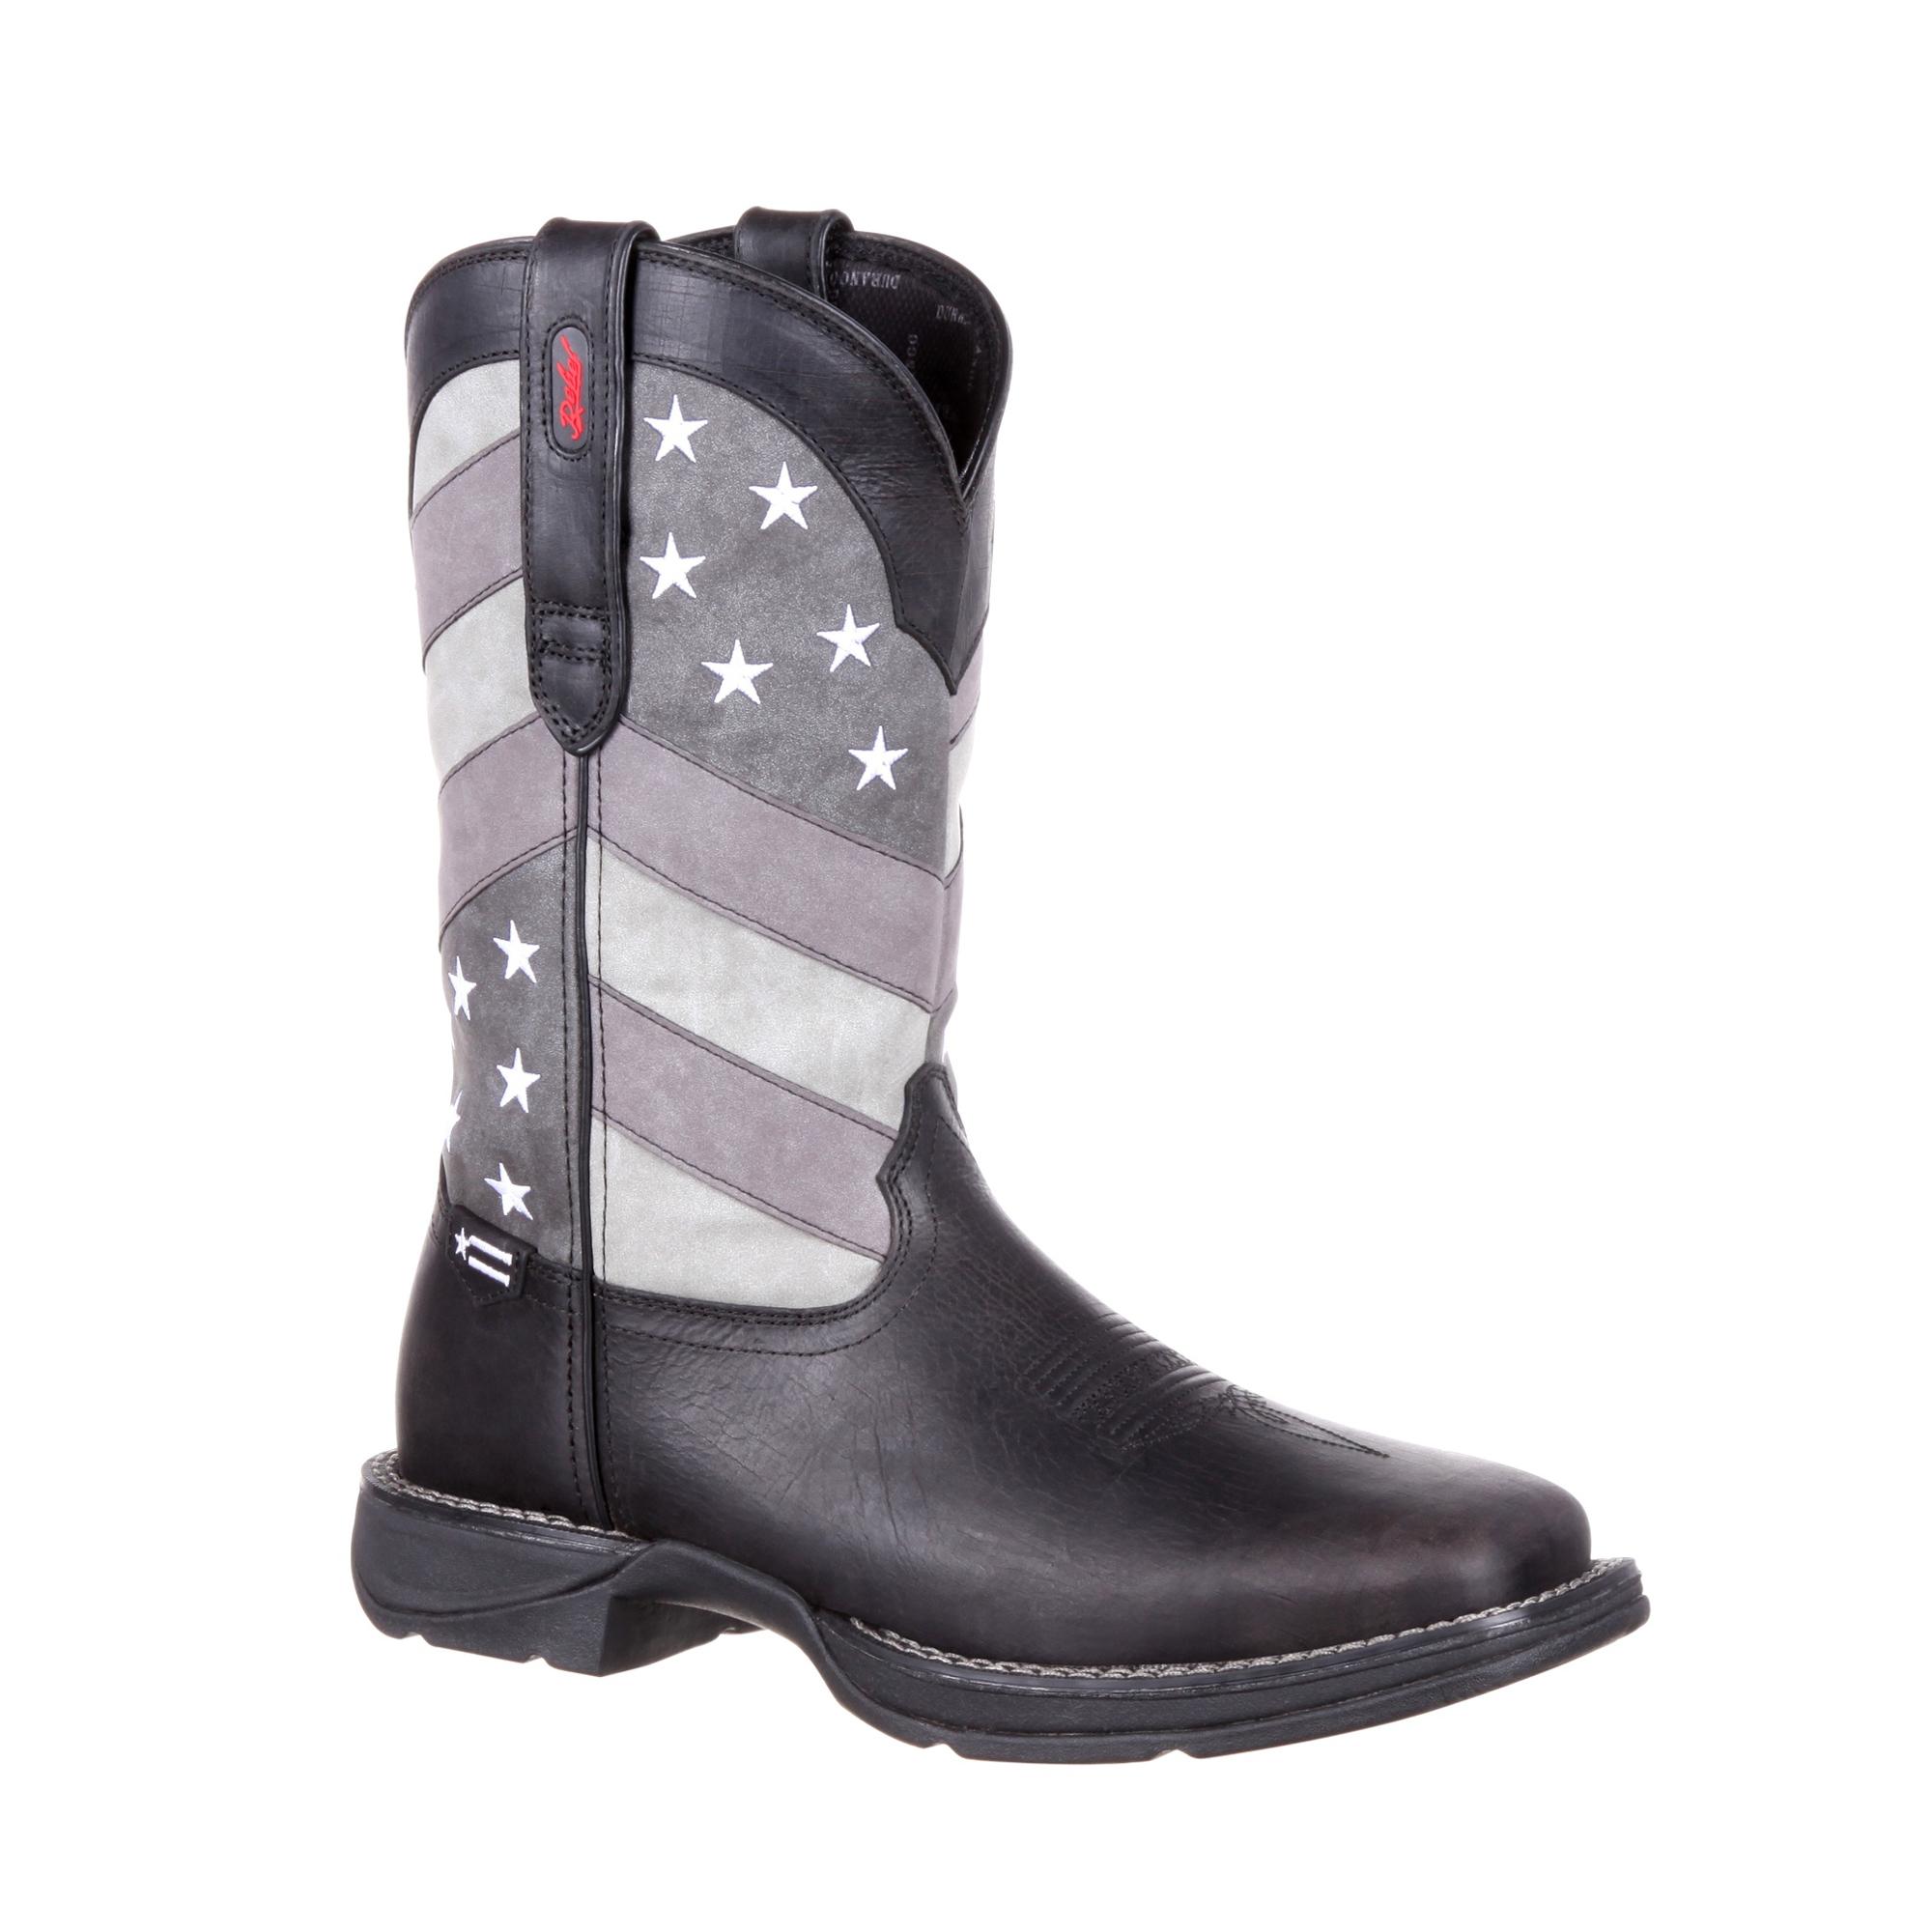 Durango Mens Black Charcoal Leather Faded Flag Cowboy Boots